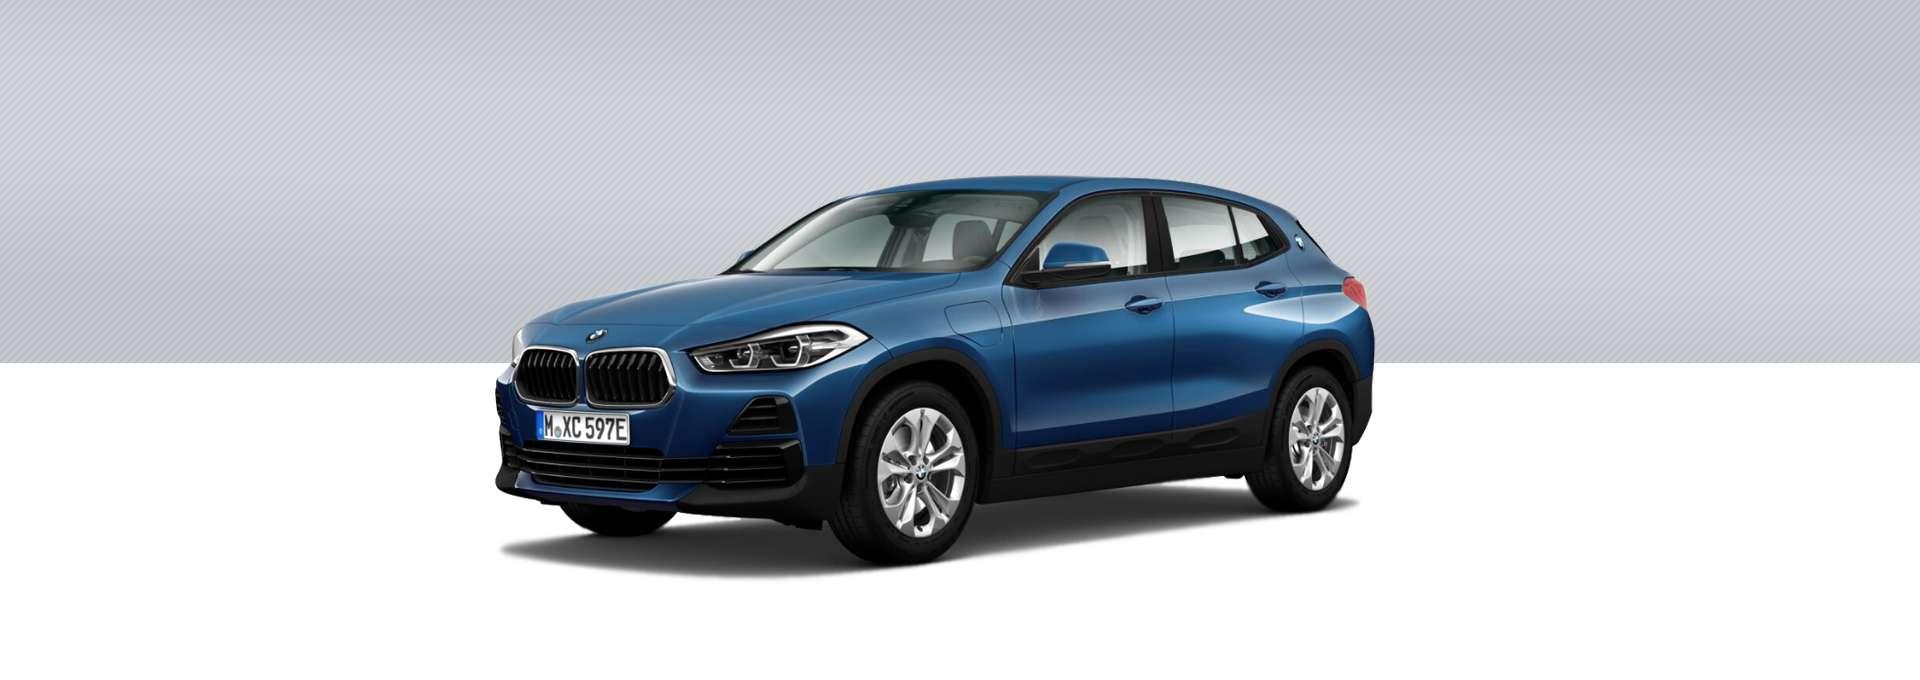 BMW Nuevo X2 Híbrido Enchufable